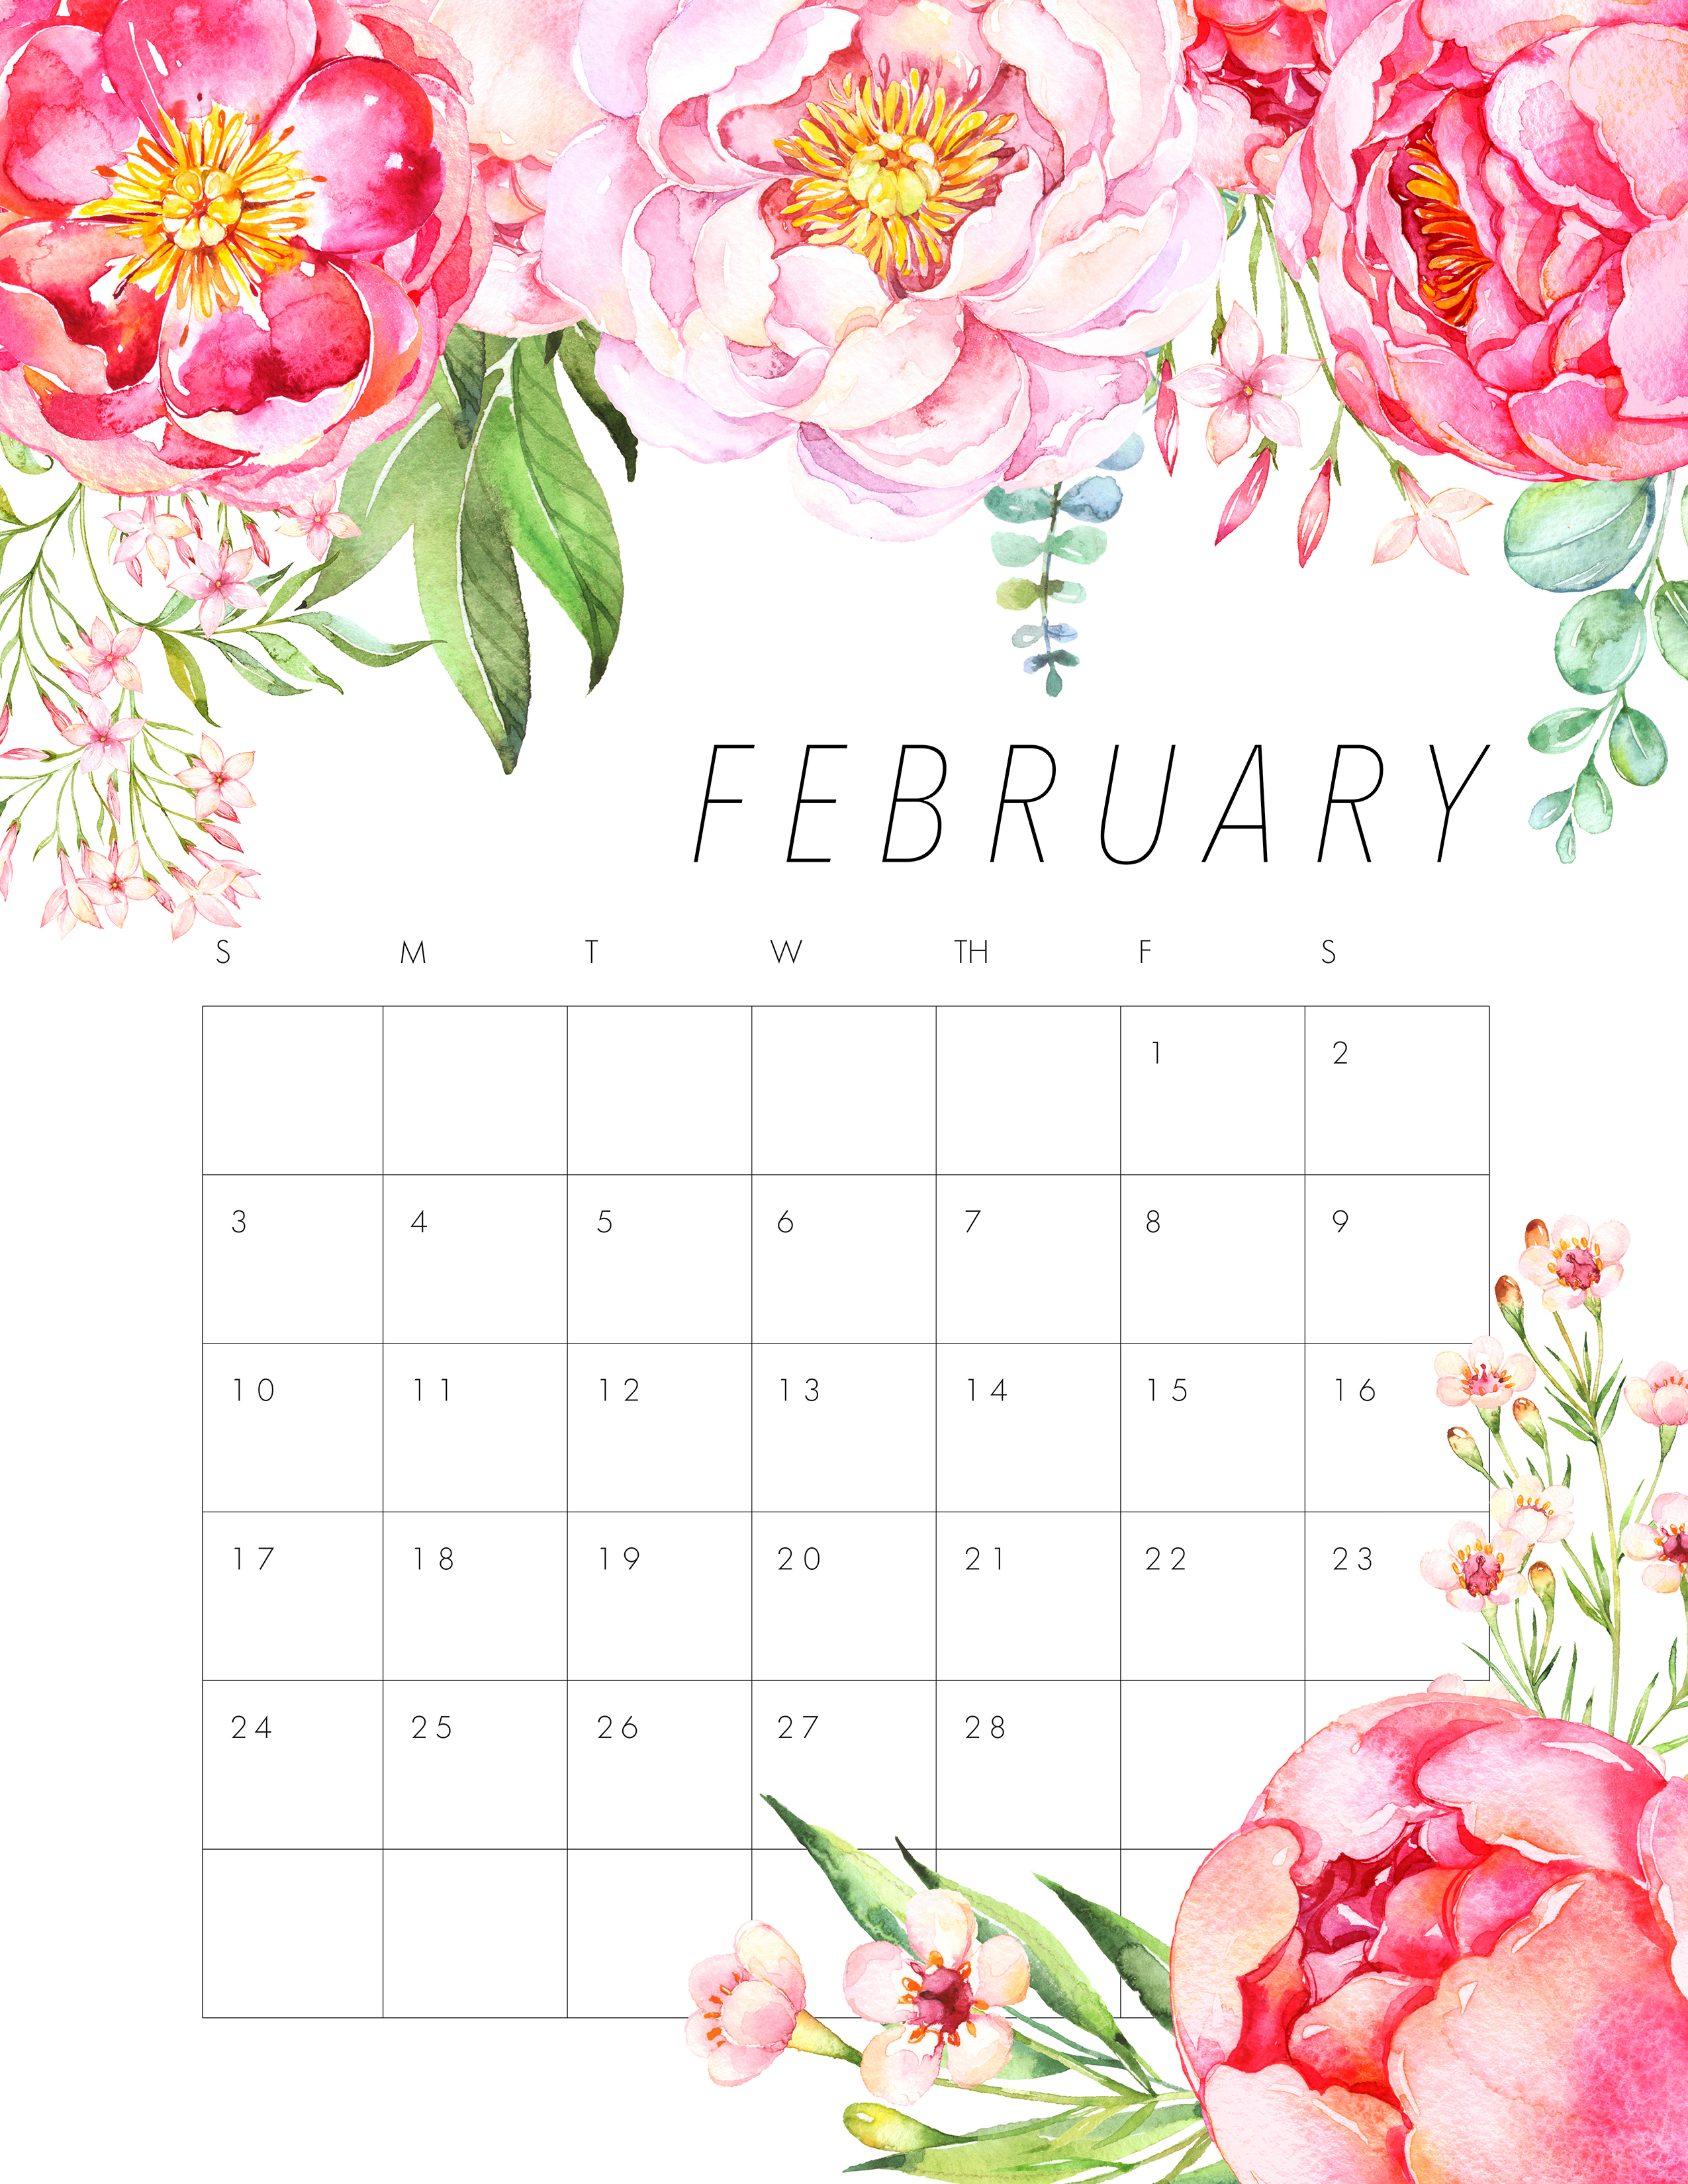 February 2019 Cute Wall Calendar